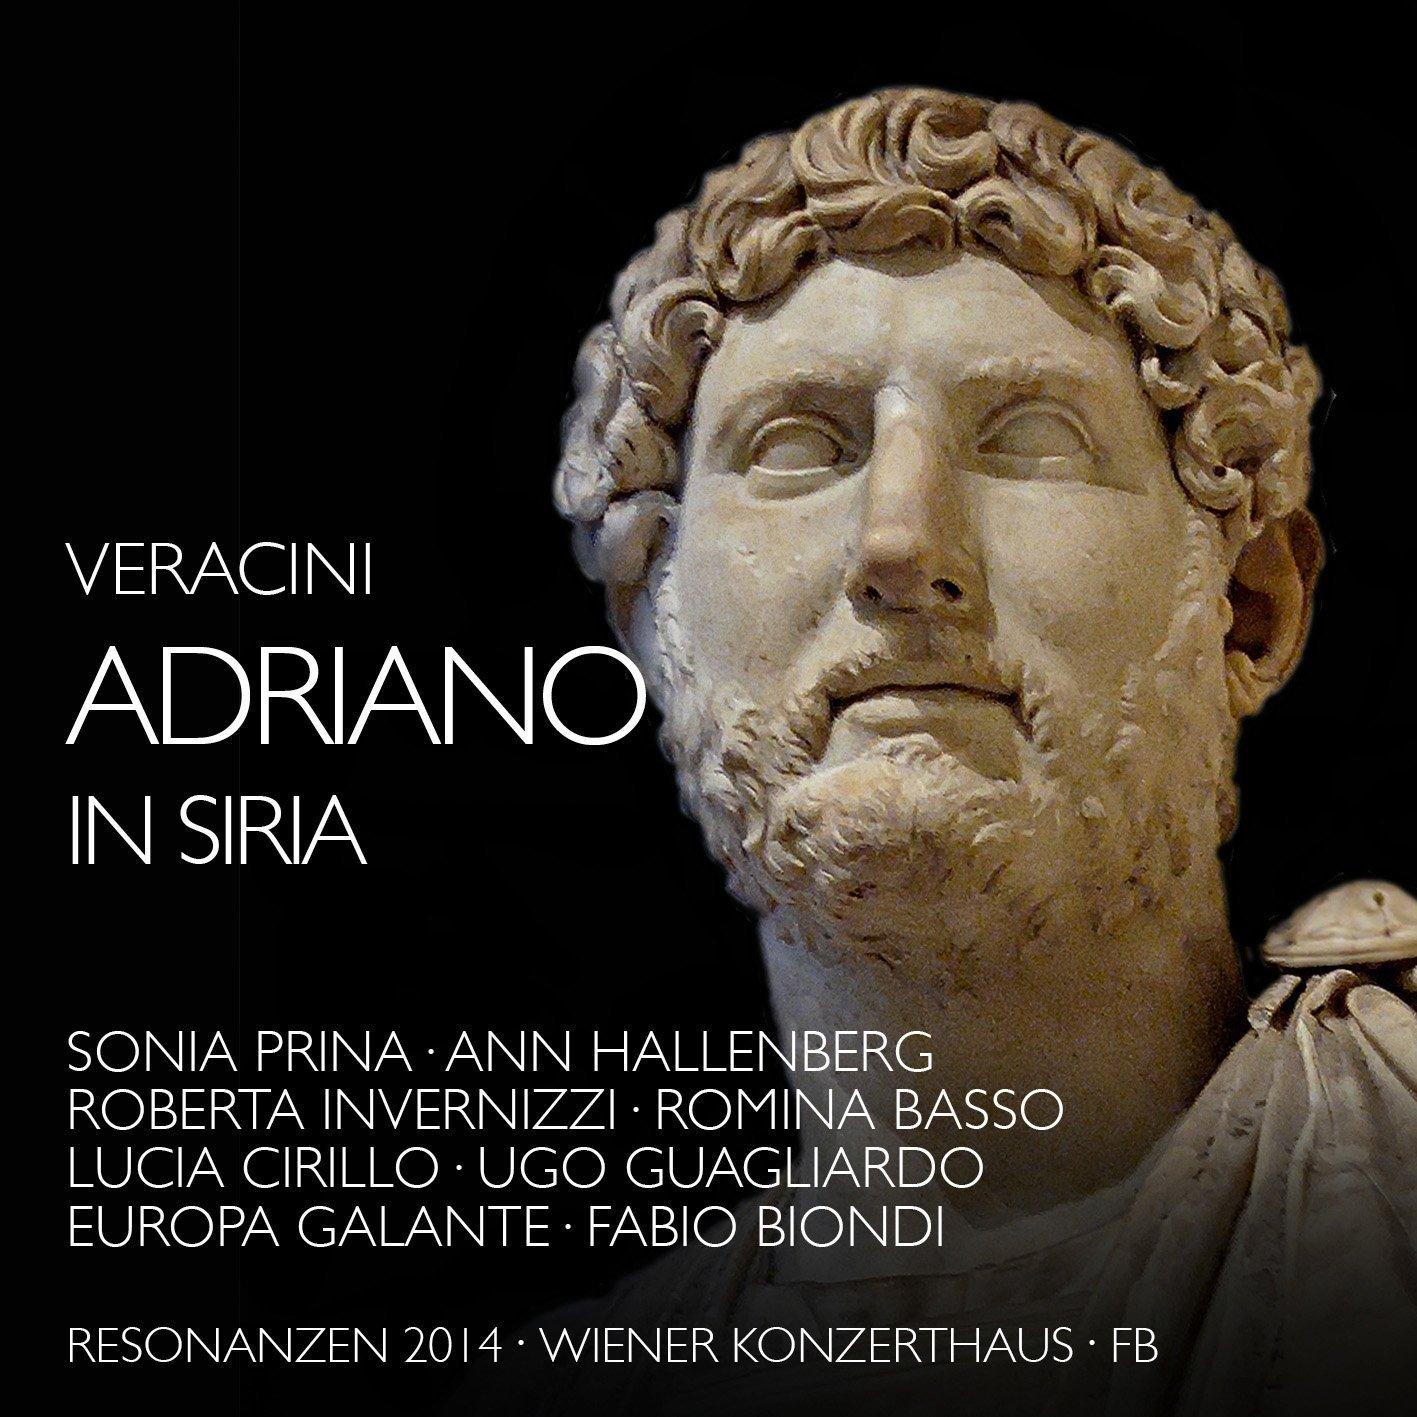 Veracini: Adriano in SiriaEuropa Galante ' Fabio BiondiWiener Konzerthaus, 2014 -